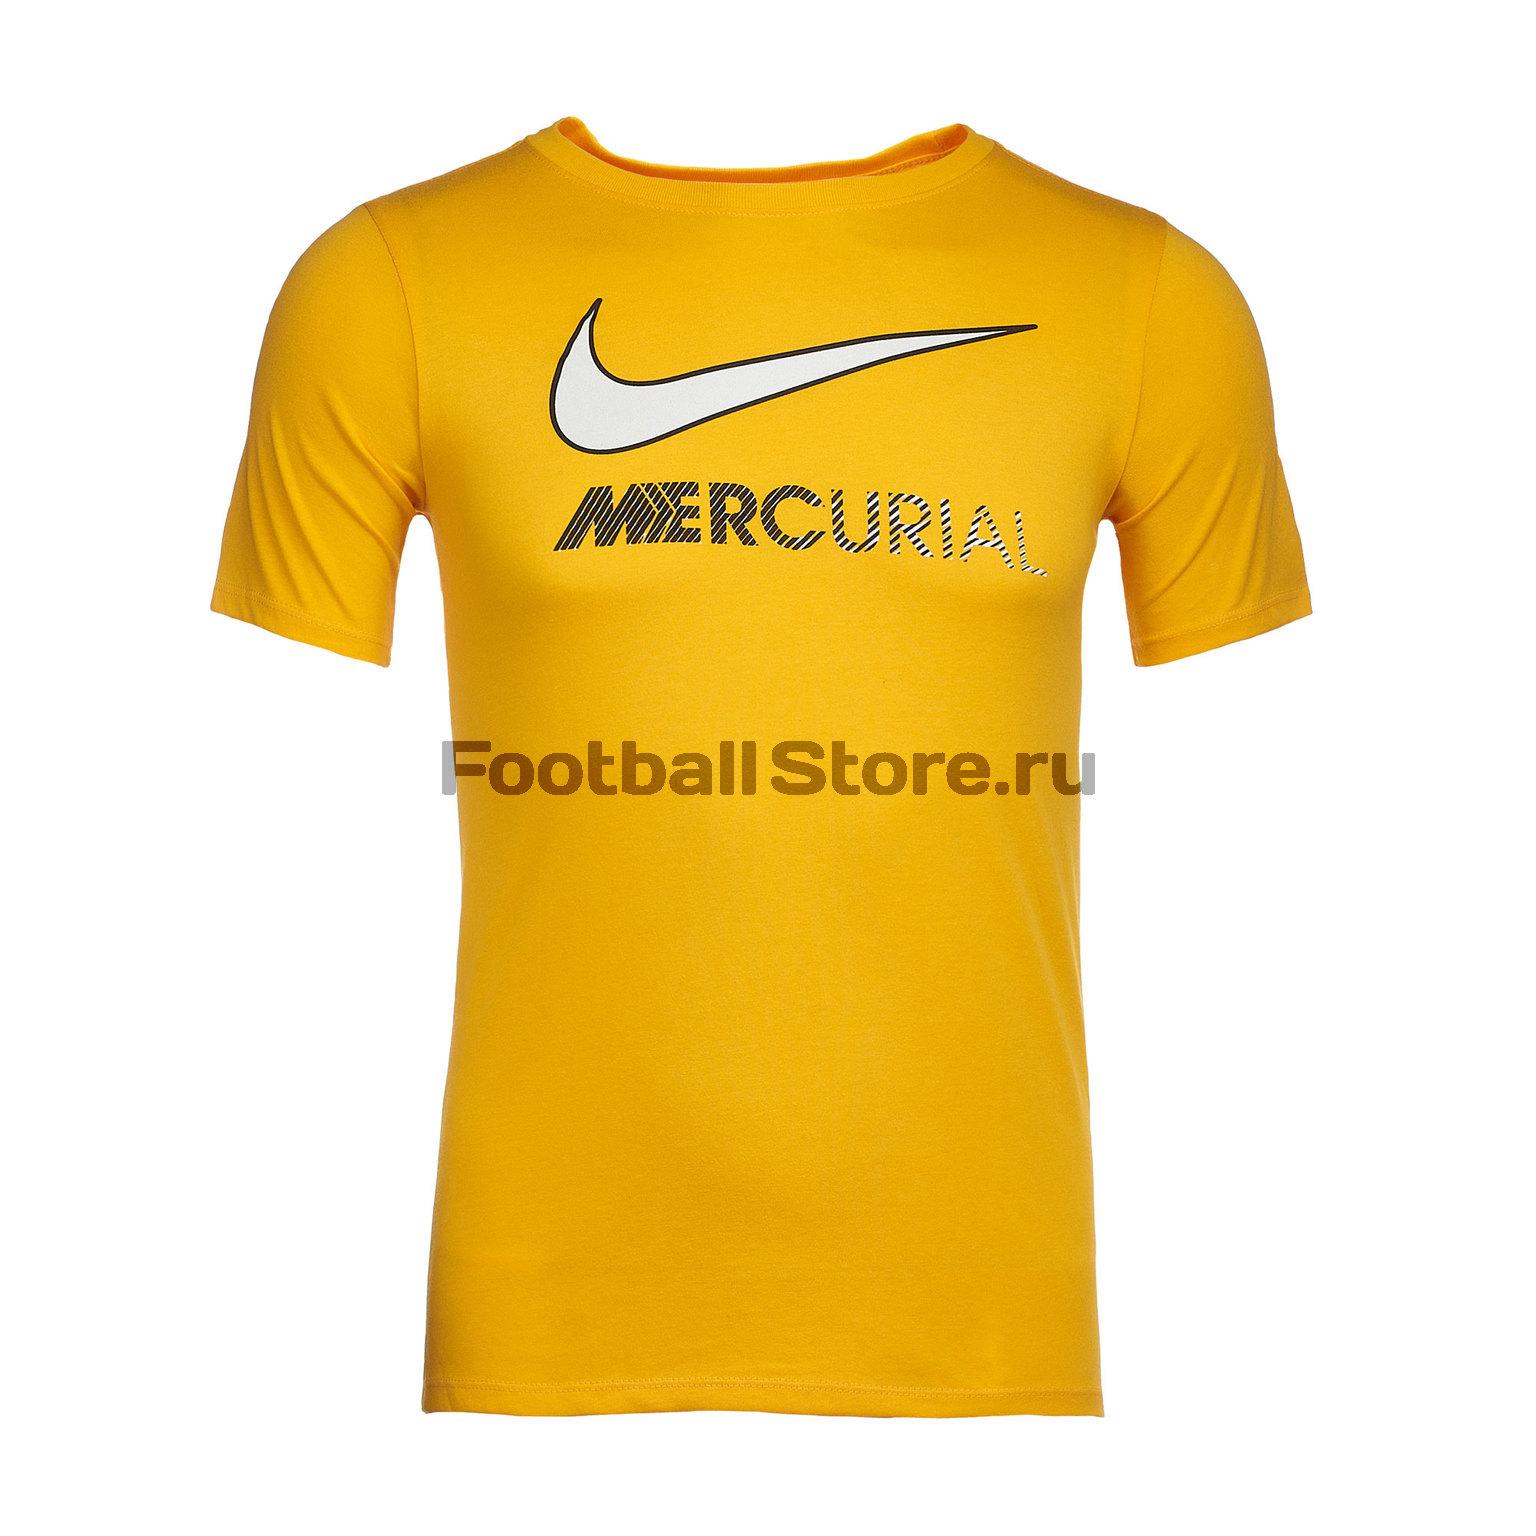 Футболка Nike Neymar Tee Boot Hook AV2763-728 футболка nike f c tee foil 810505 101